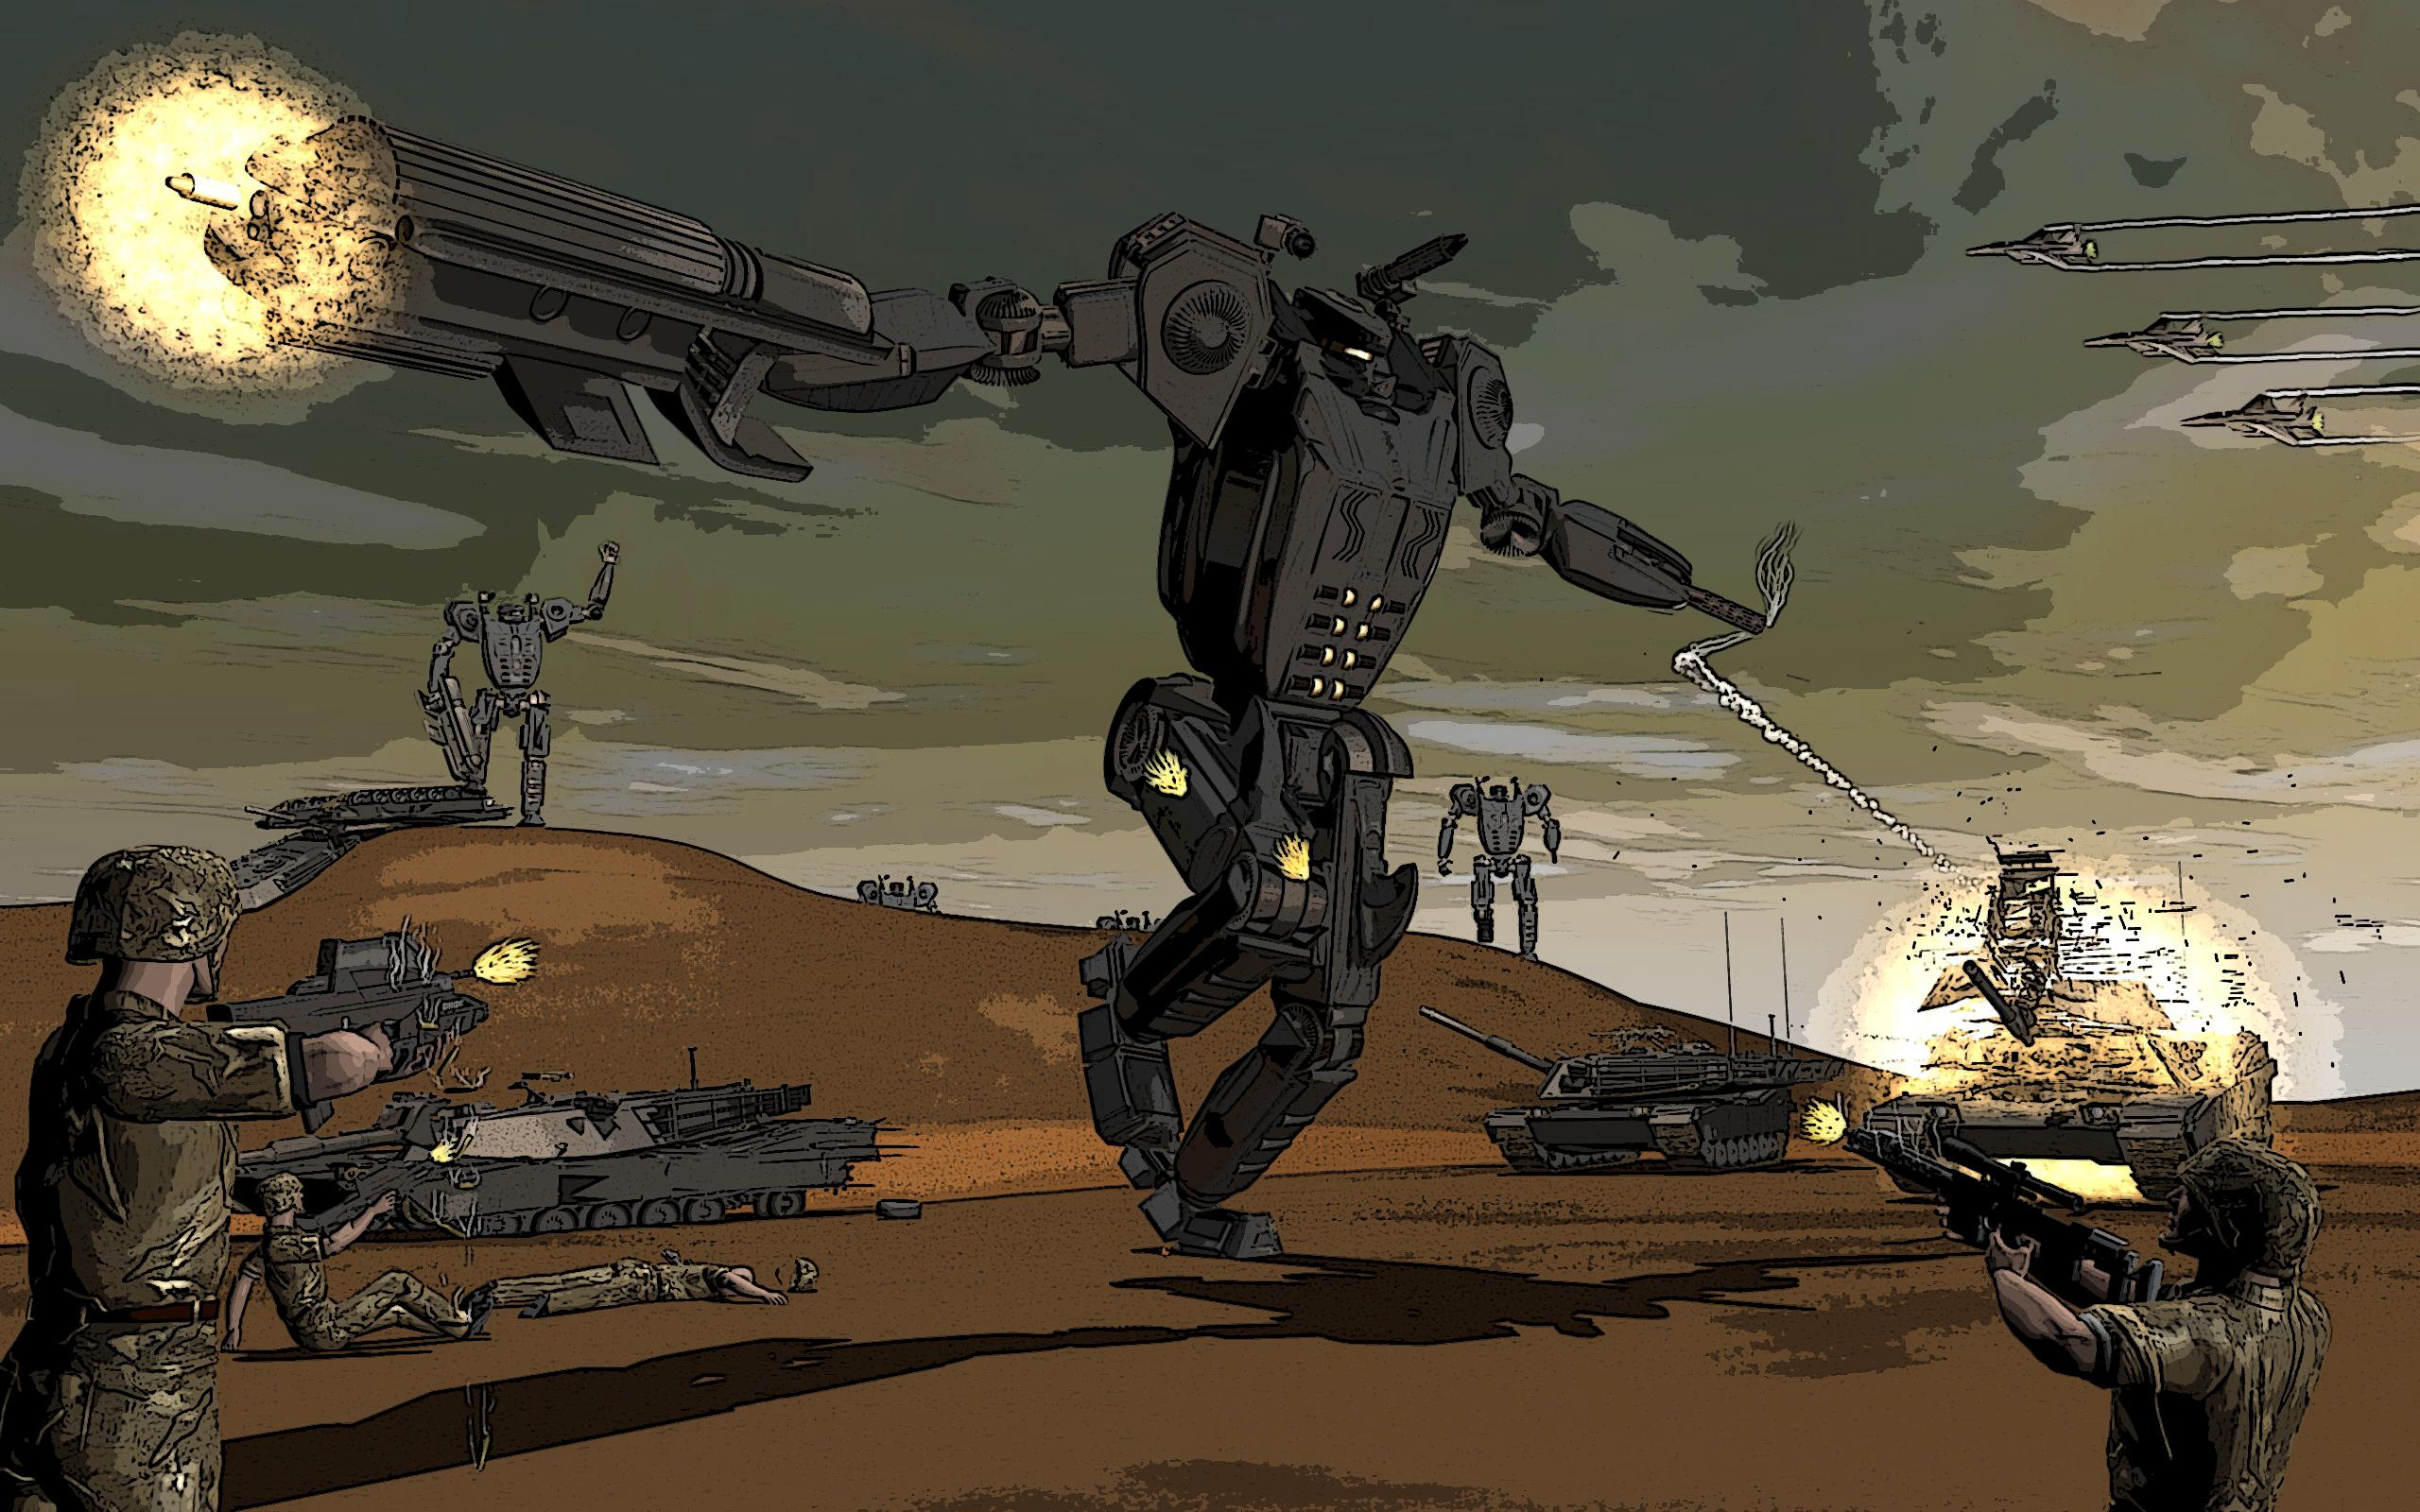 war against machines hd wallpaper background image